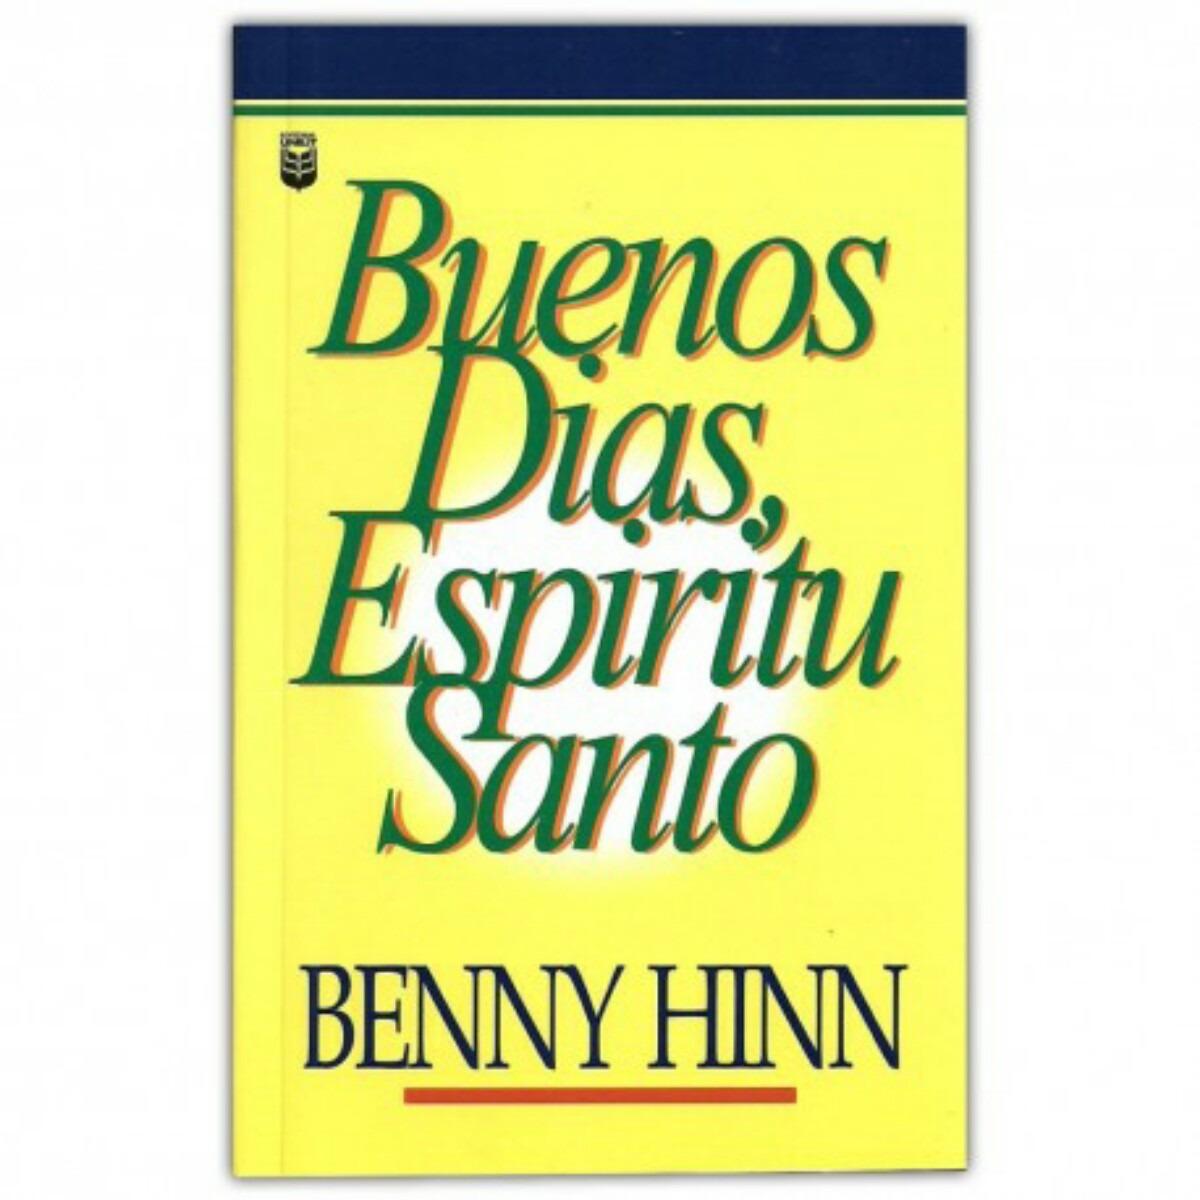 Bienvenido espiritu santo benny hinn pdf this book fandeluxe Choice Image